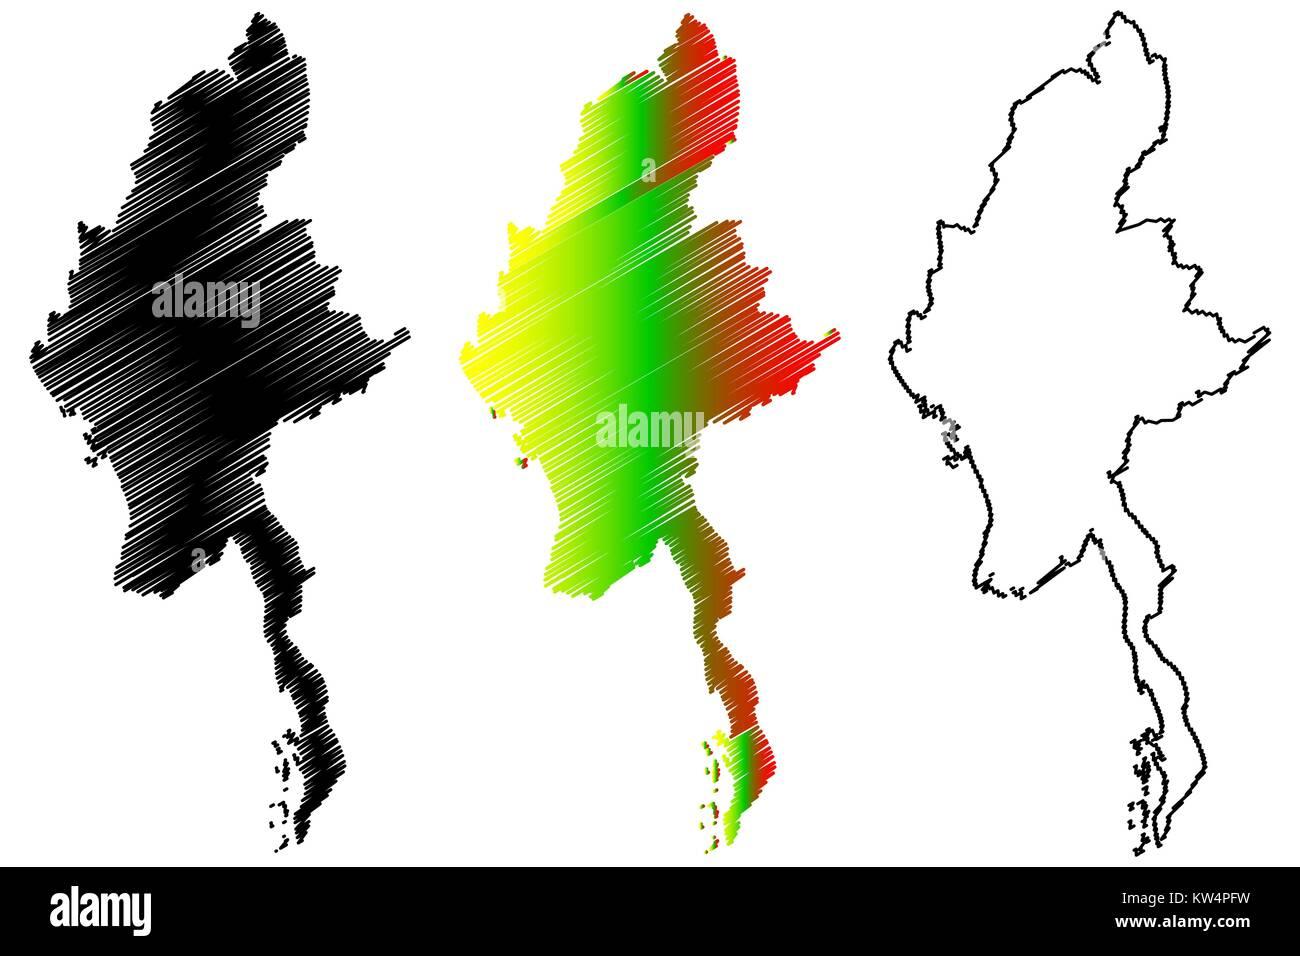 Myanmar map vector illustration, scribble sketch Republic of the Union of Myanmar, Burma, - Stock Vector